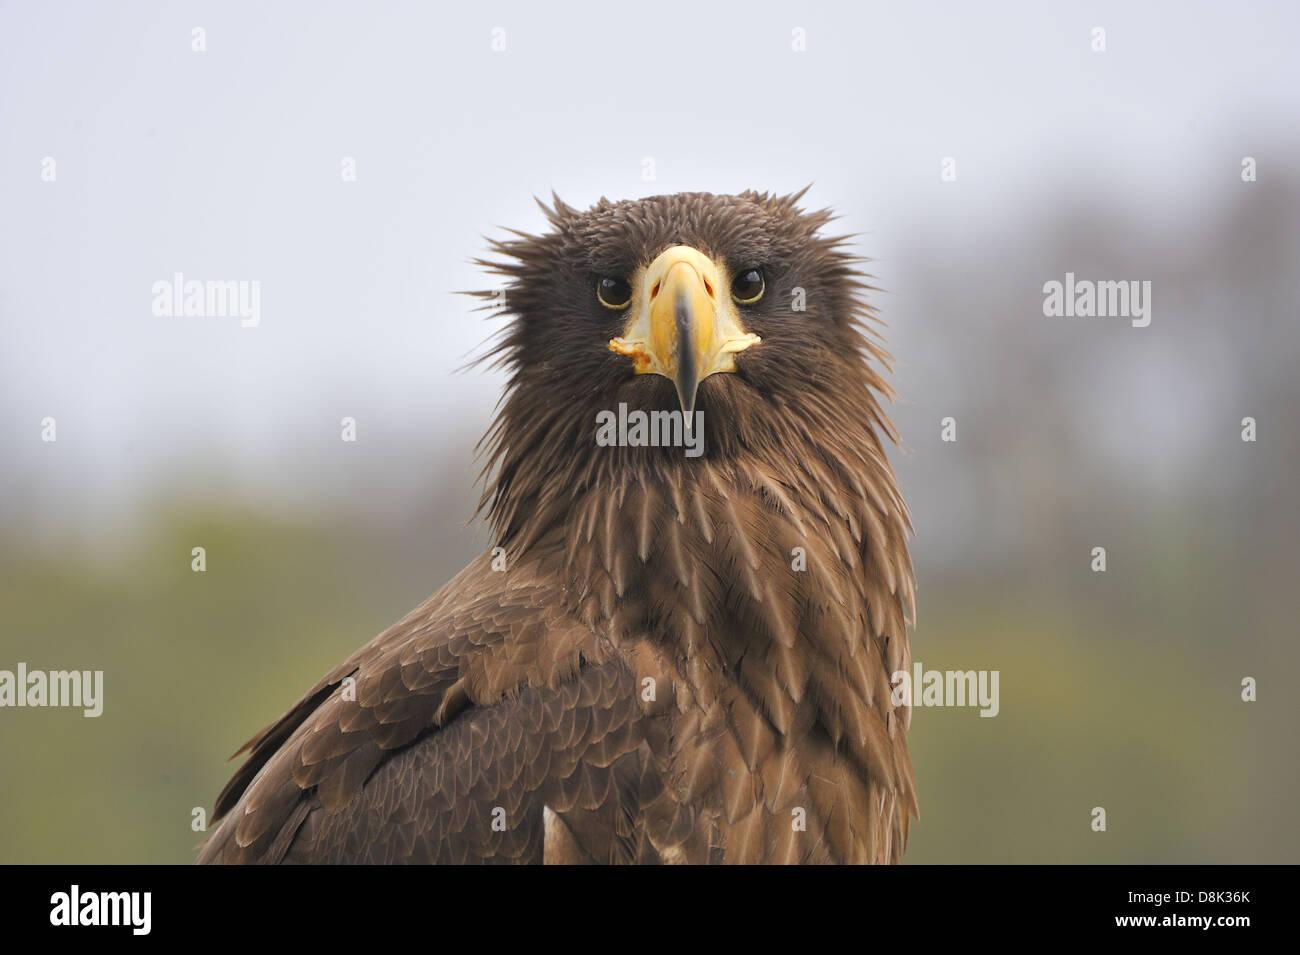 Steller's Sea Eagle - Stock Image